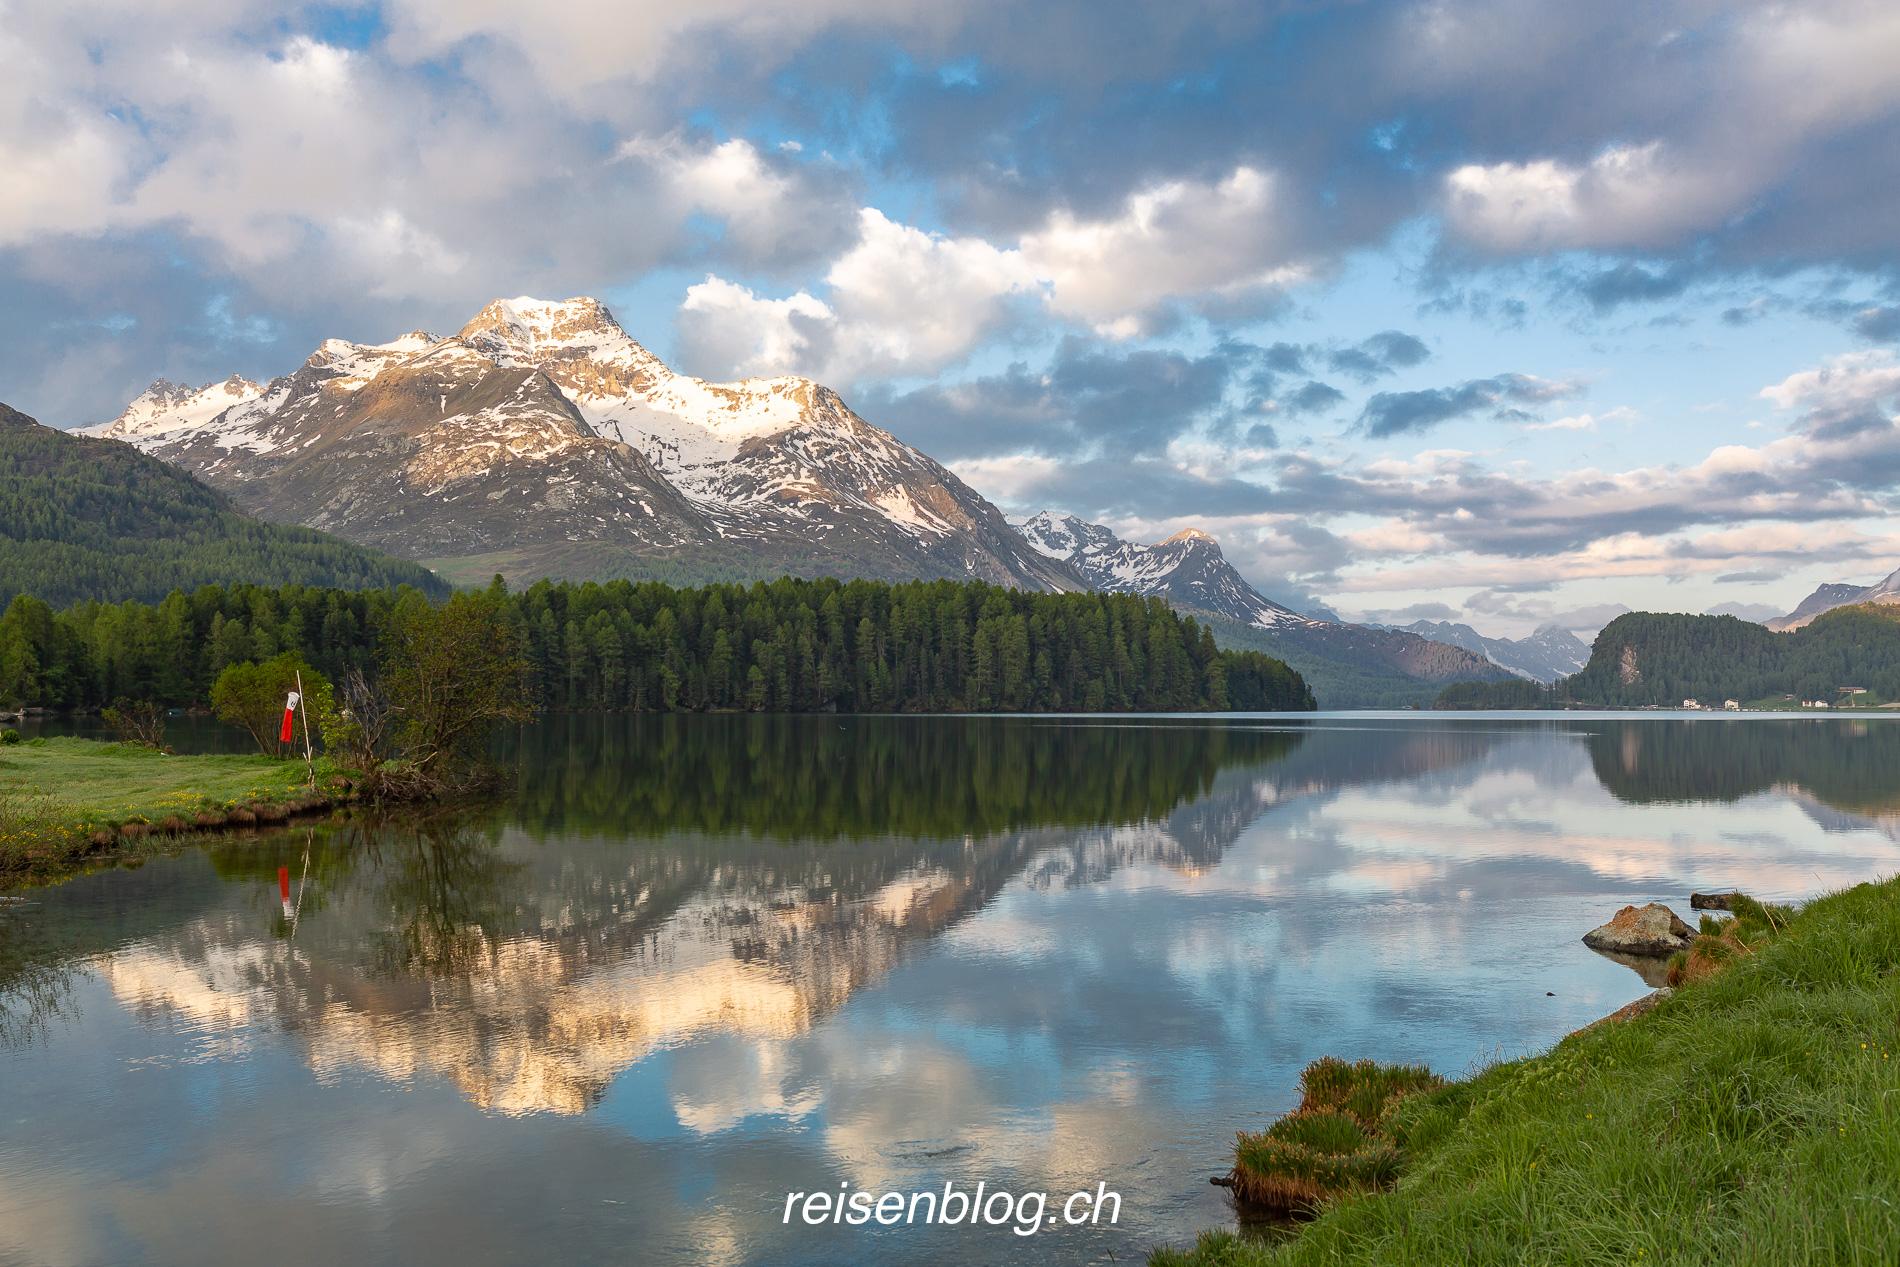 Reisenblog-2382